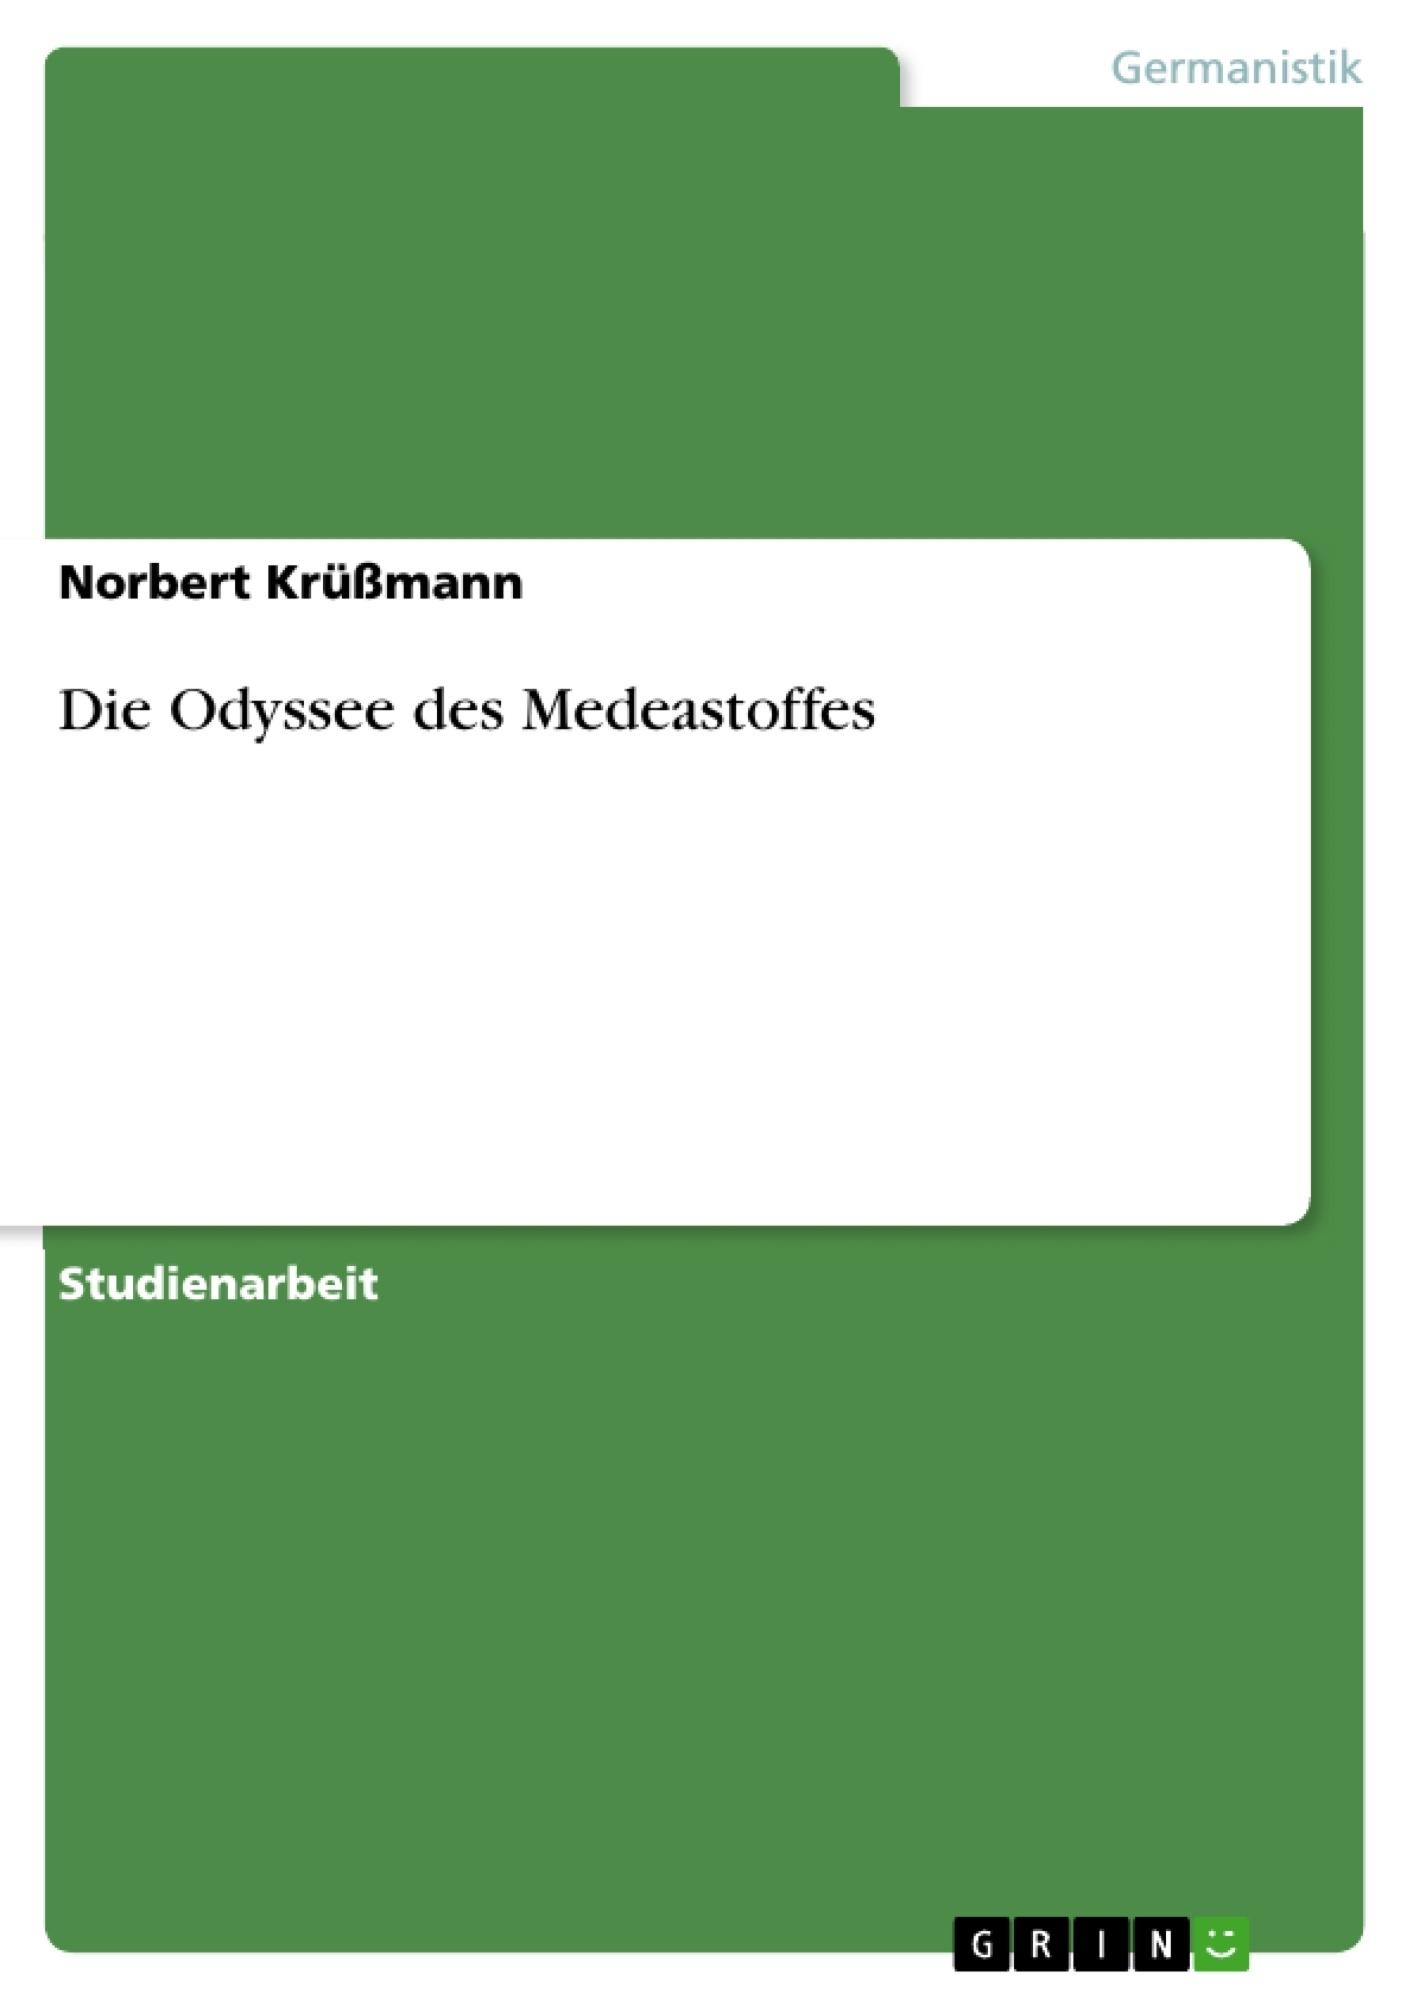 Titel: Die Odyssee des Medeastoffes